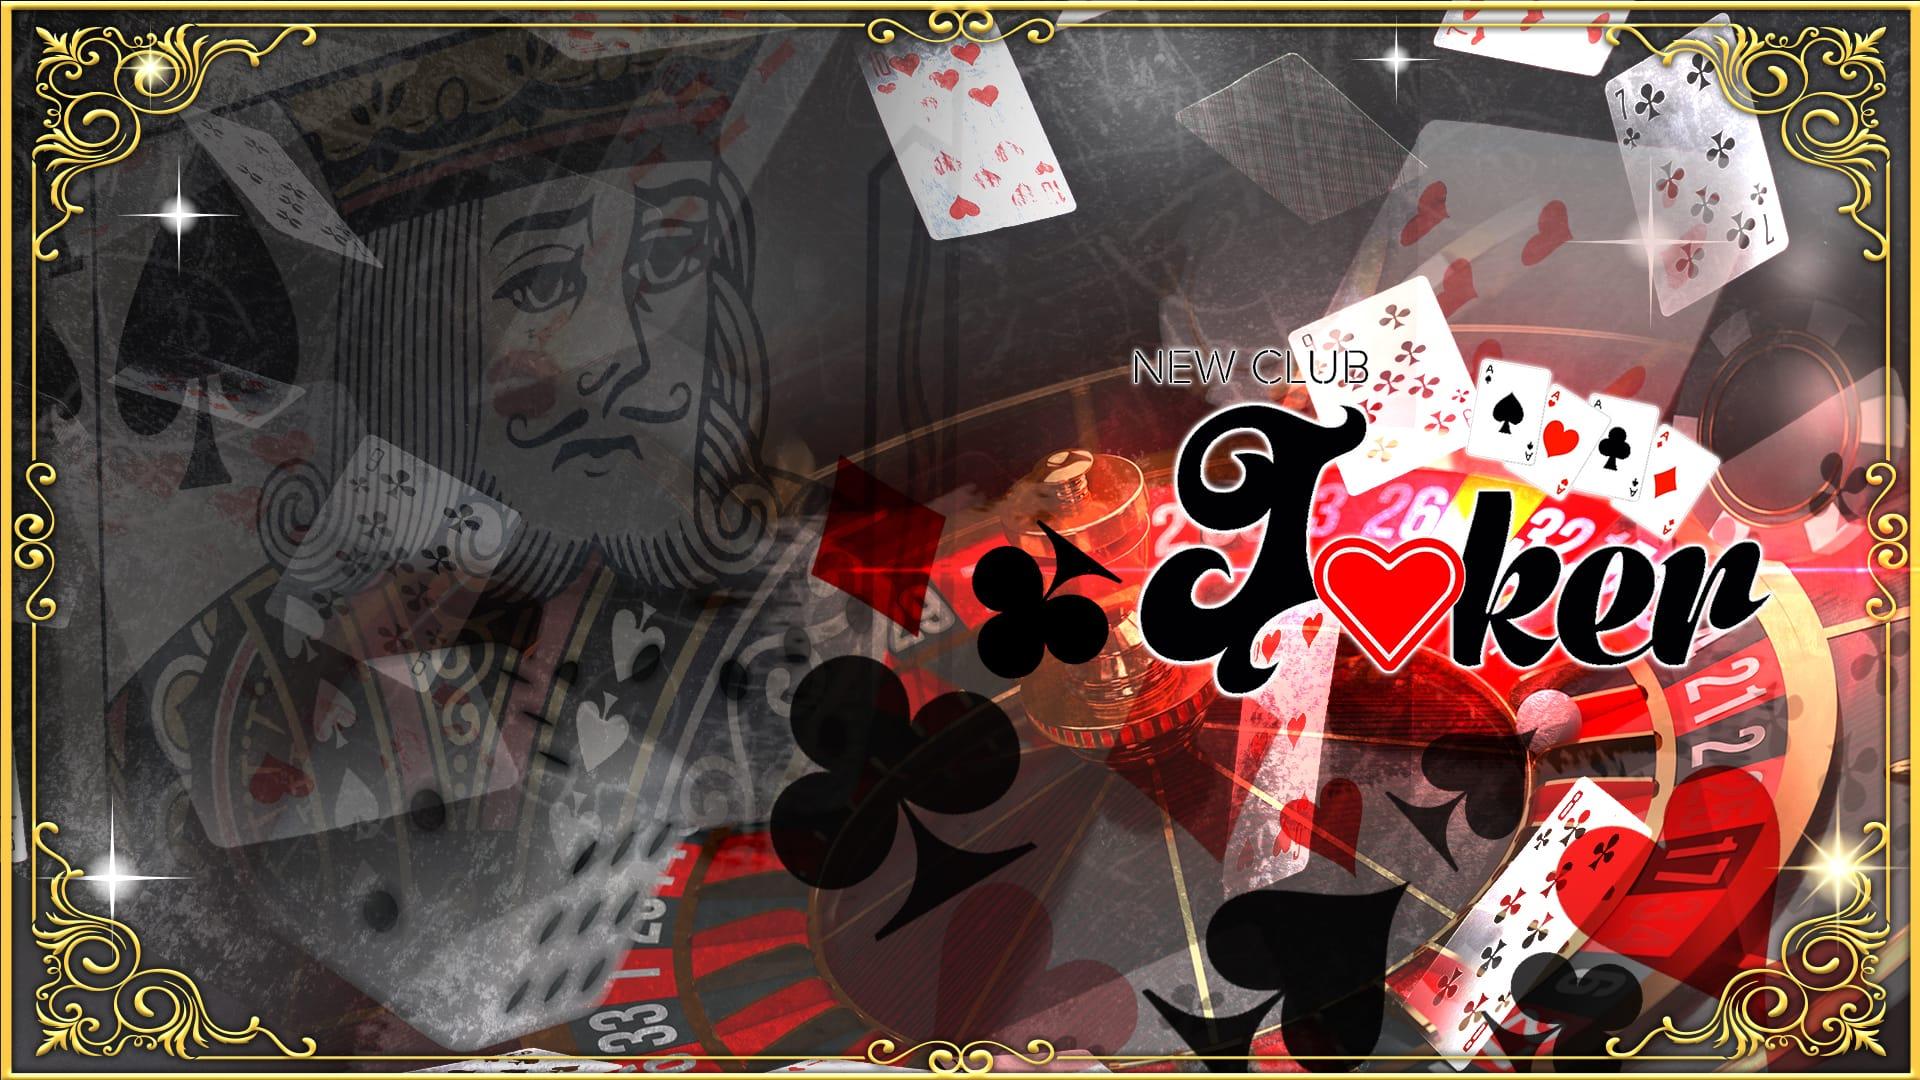 New Club Joker(ジョーカー) 葛西キャバクラ TOP画像